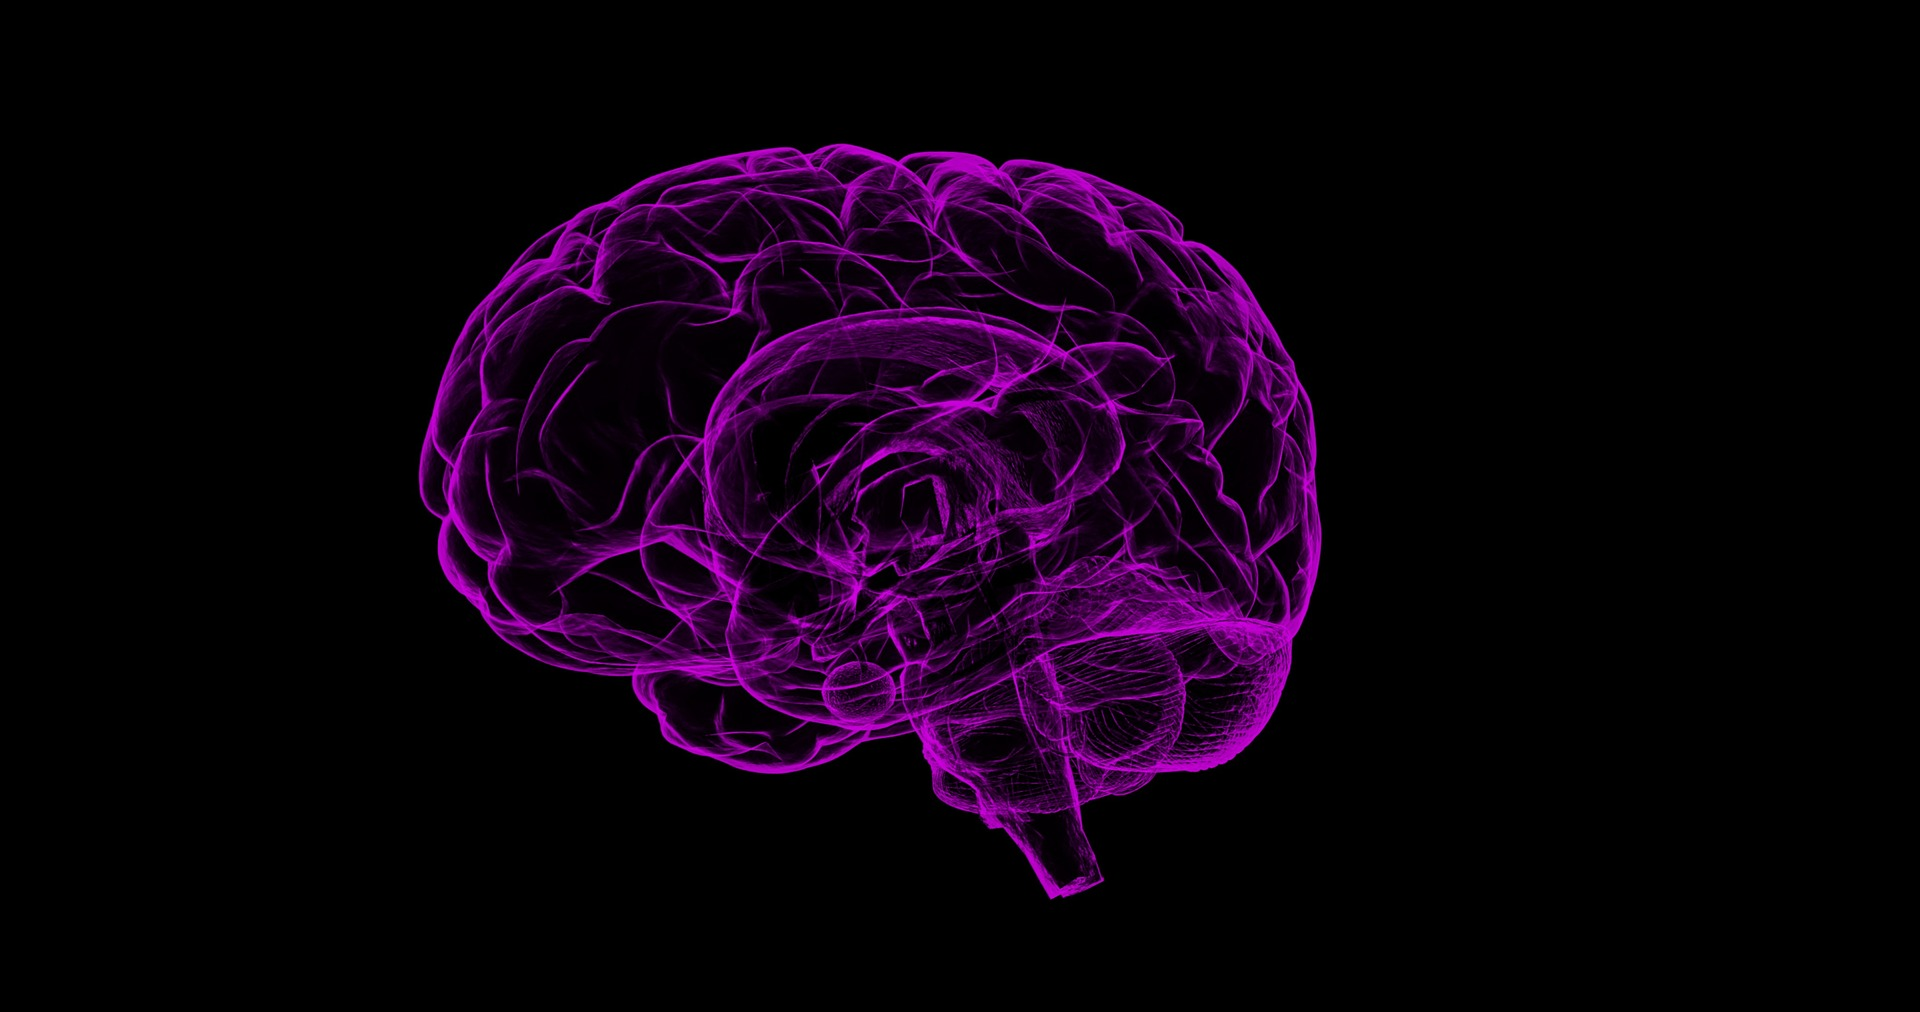 El cerebro humano ha de ejercitarse